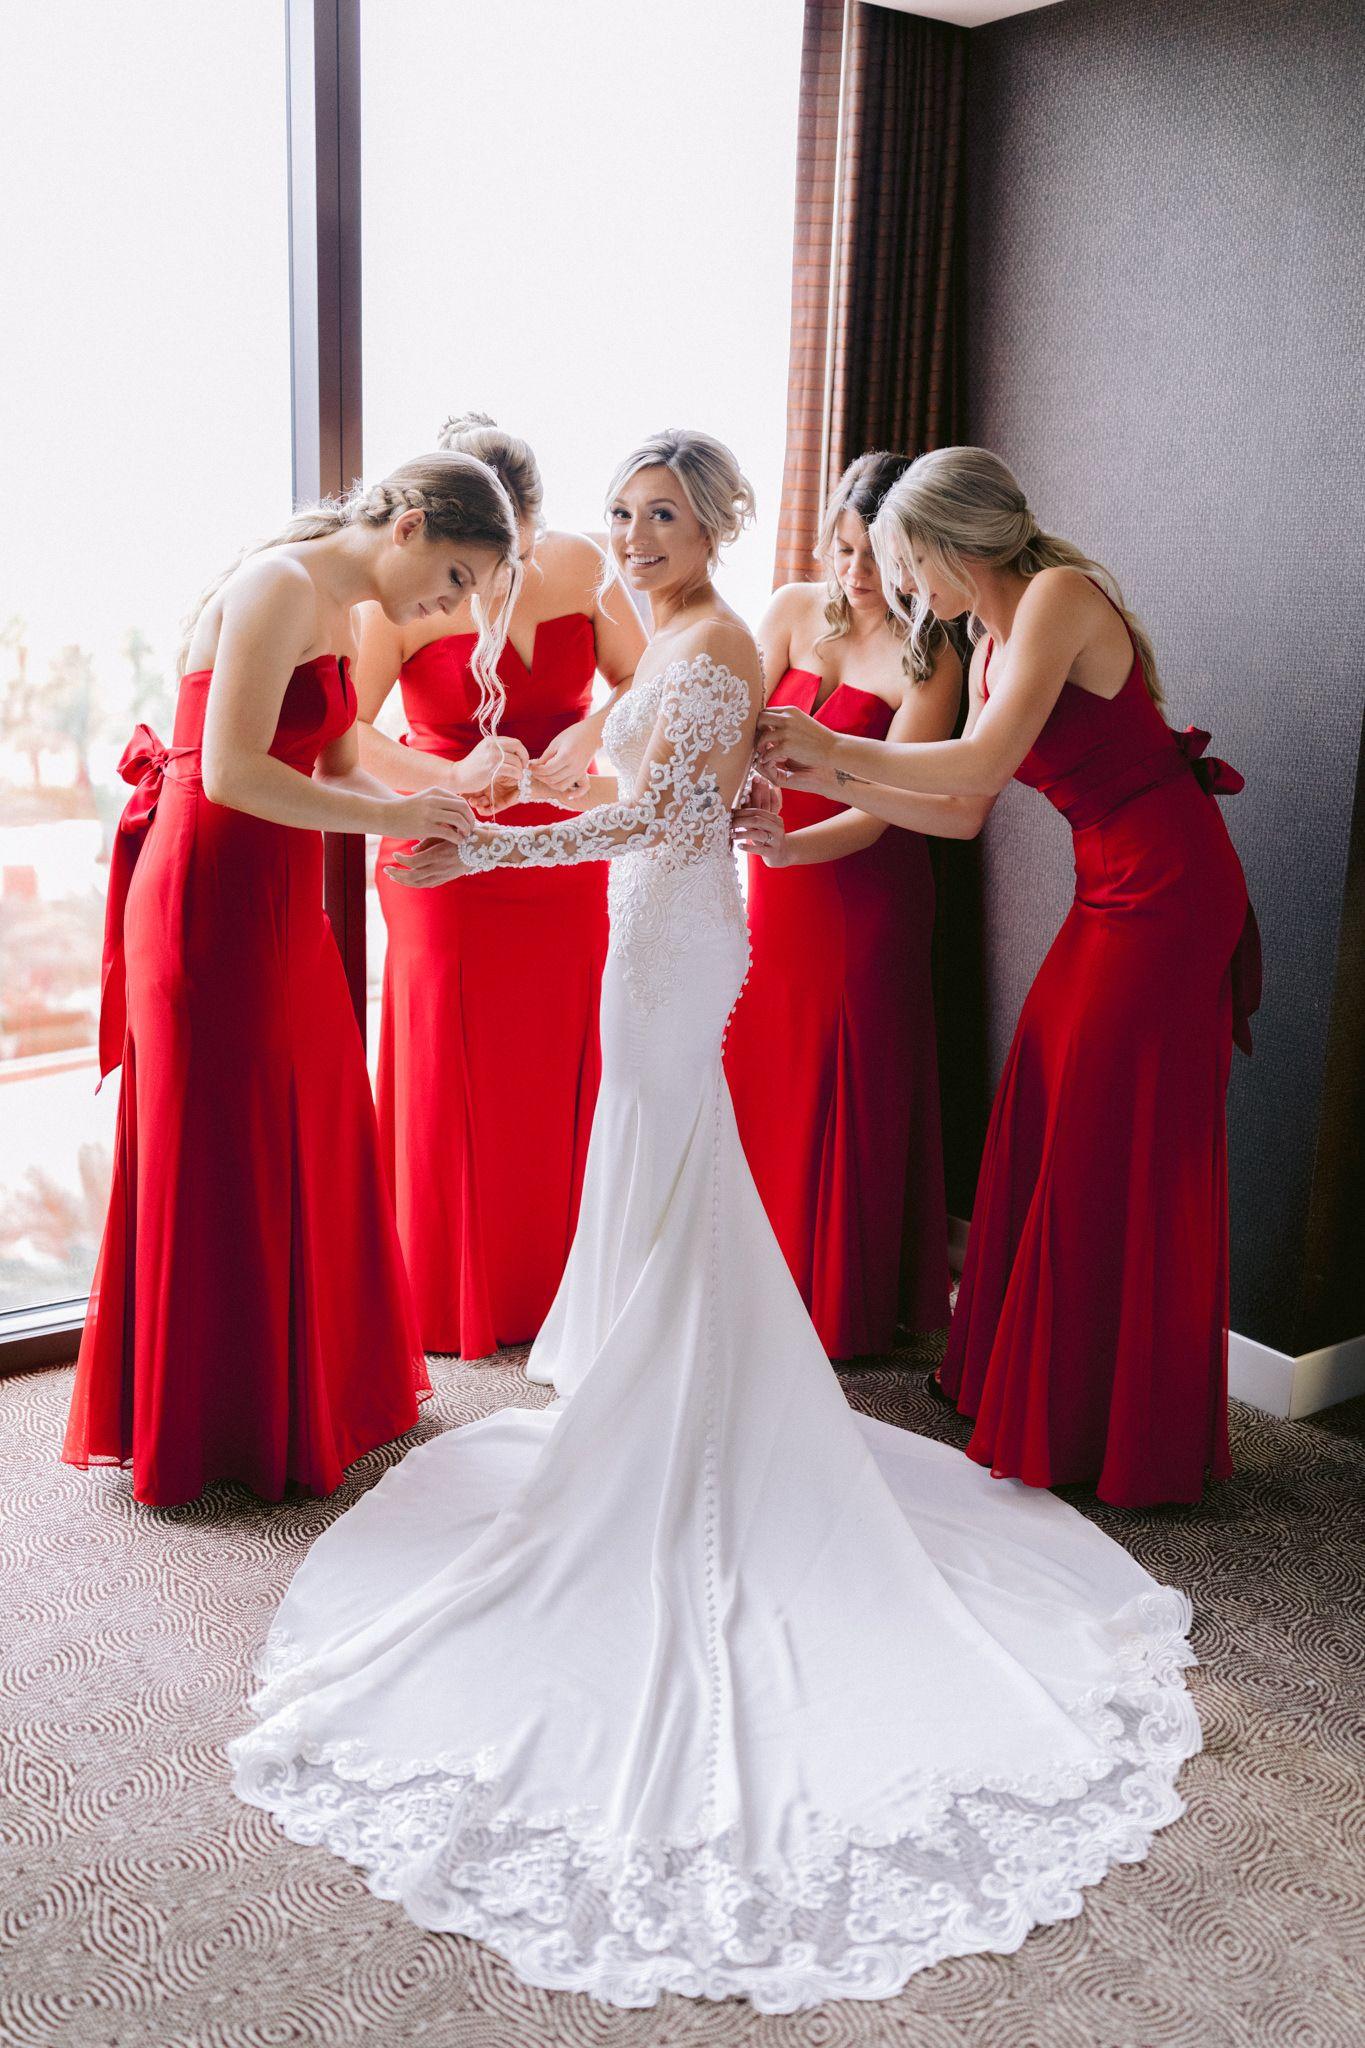 December Las Vegas Wedding Wedding Dresses Lace Red Wedding Colorful Bridal Bouquet [ 2048 x 1365 Pixel ]